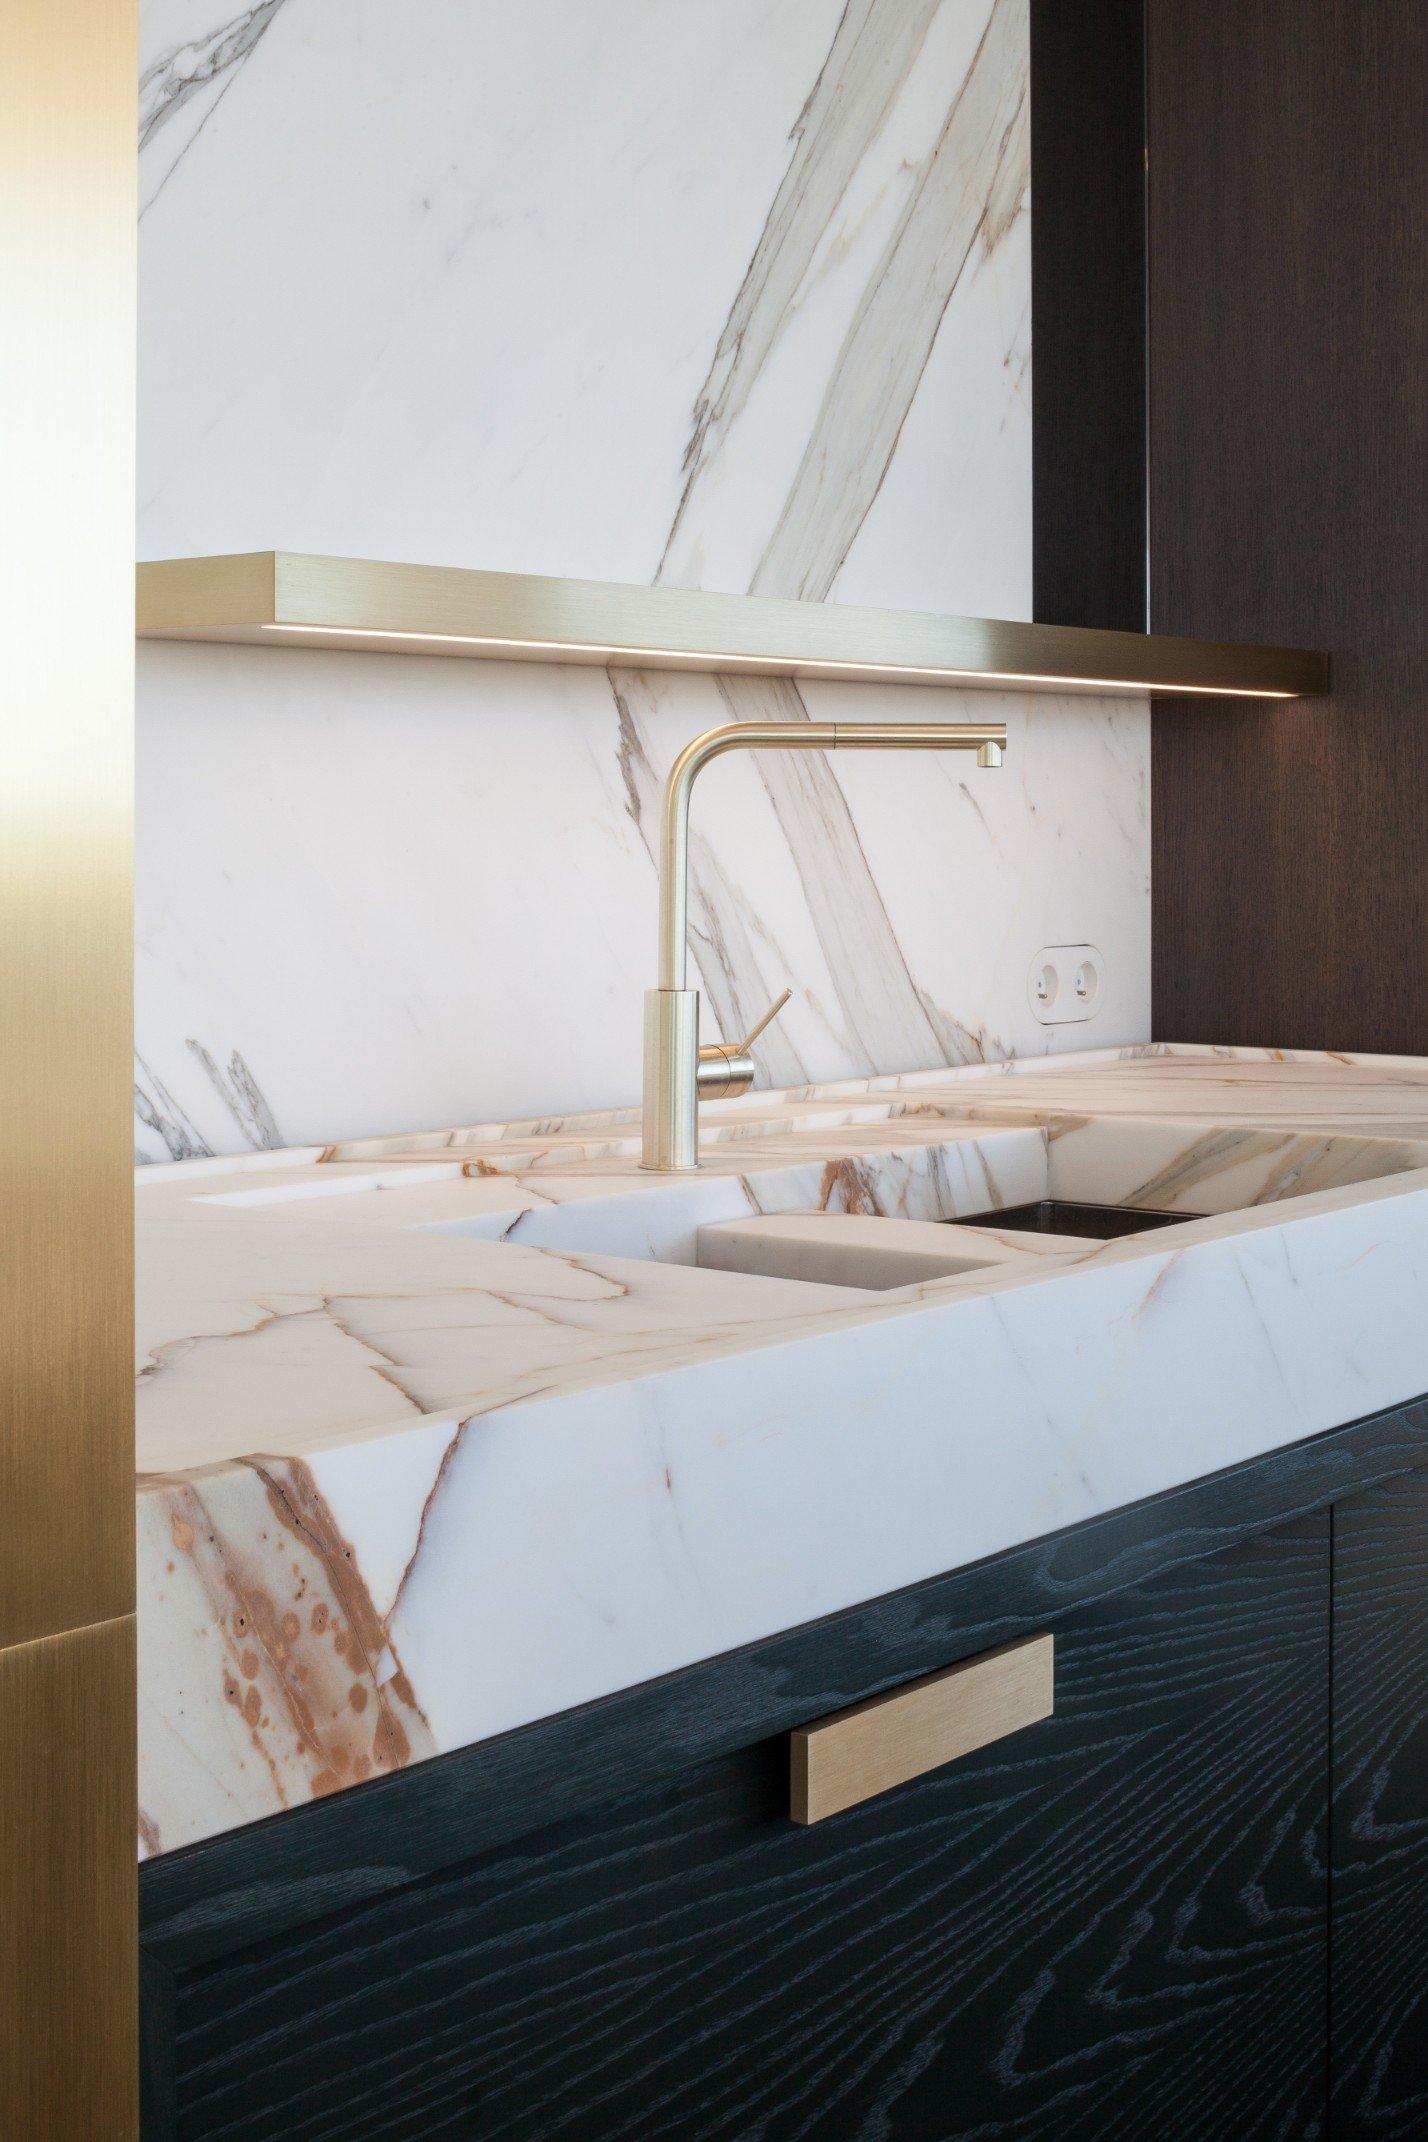 Rietveldprojects-penthouse-appartement-design-architectuur-kust30